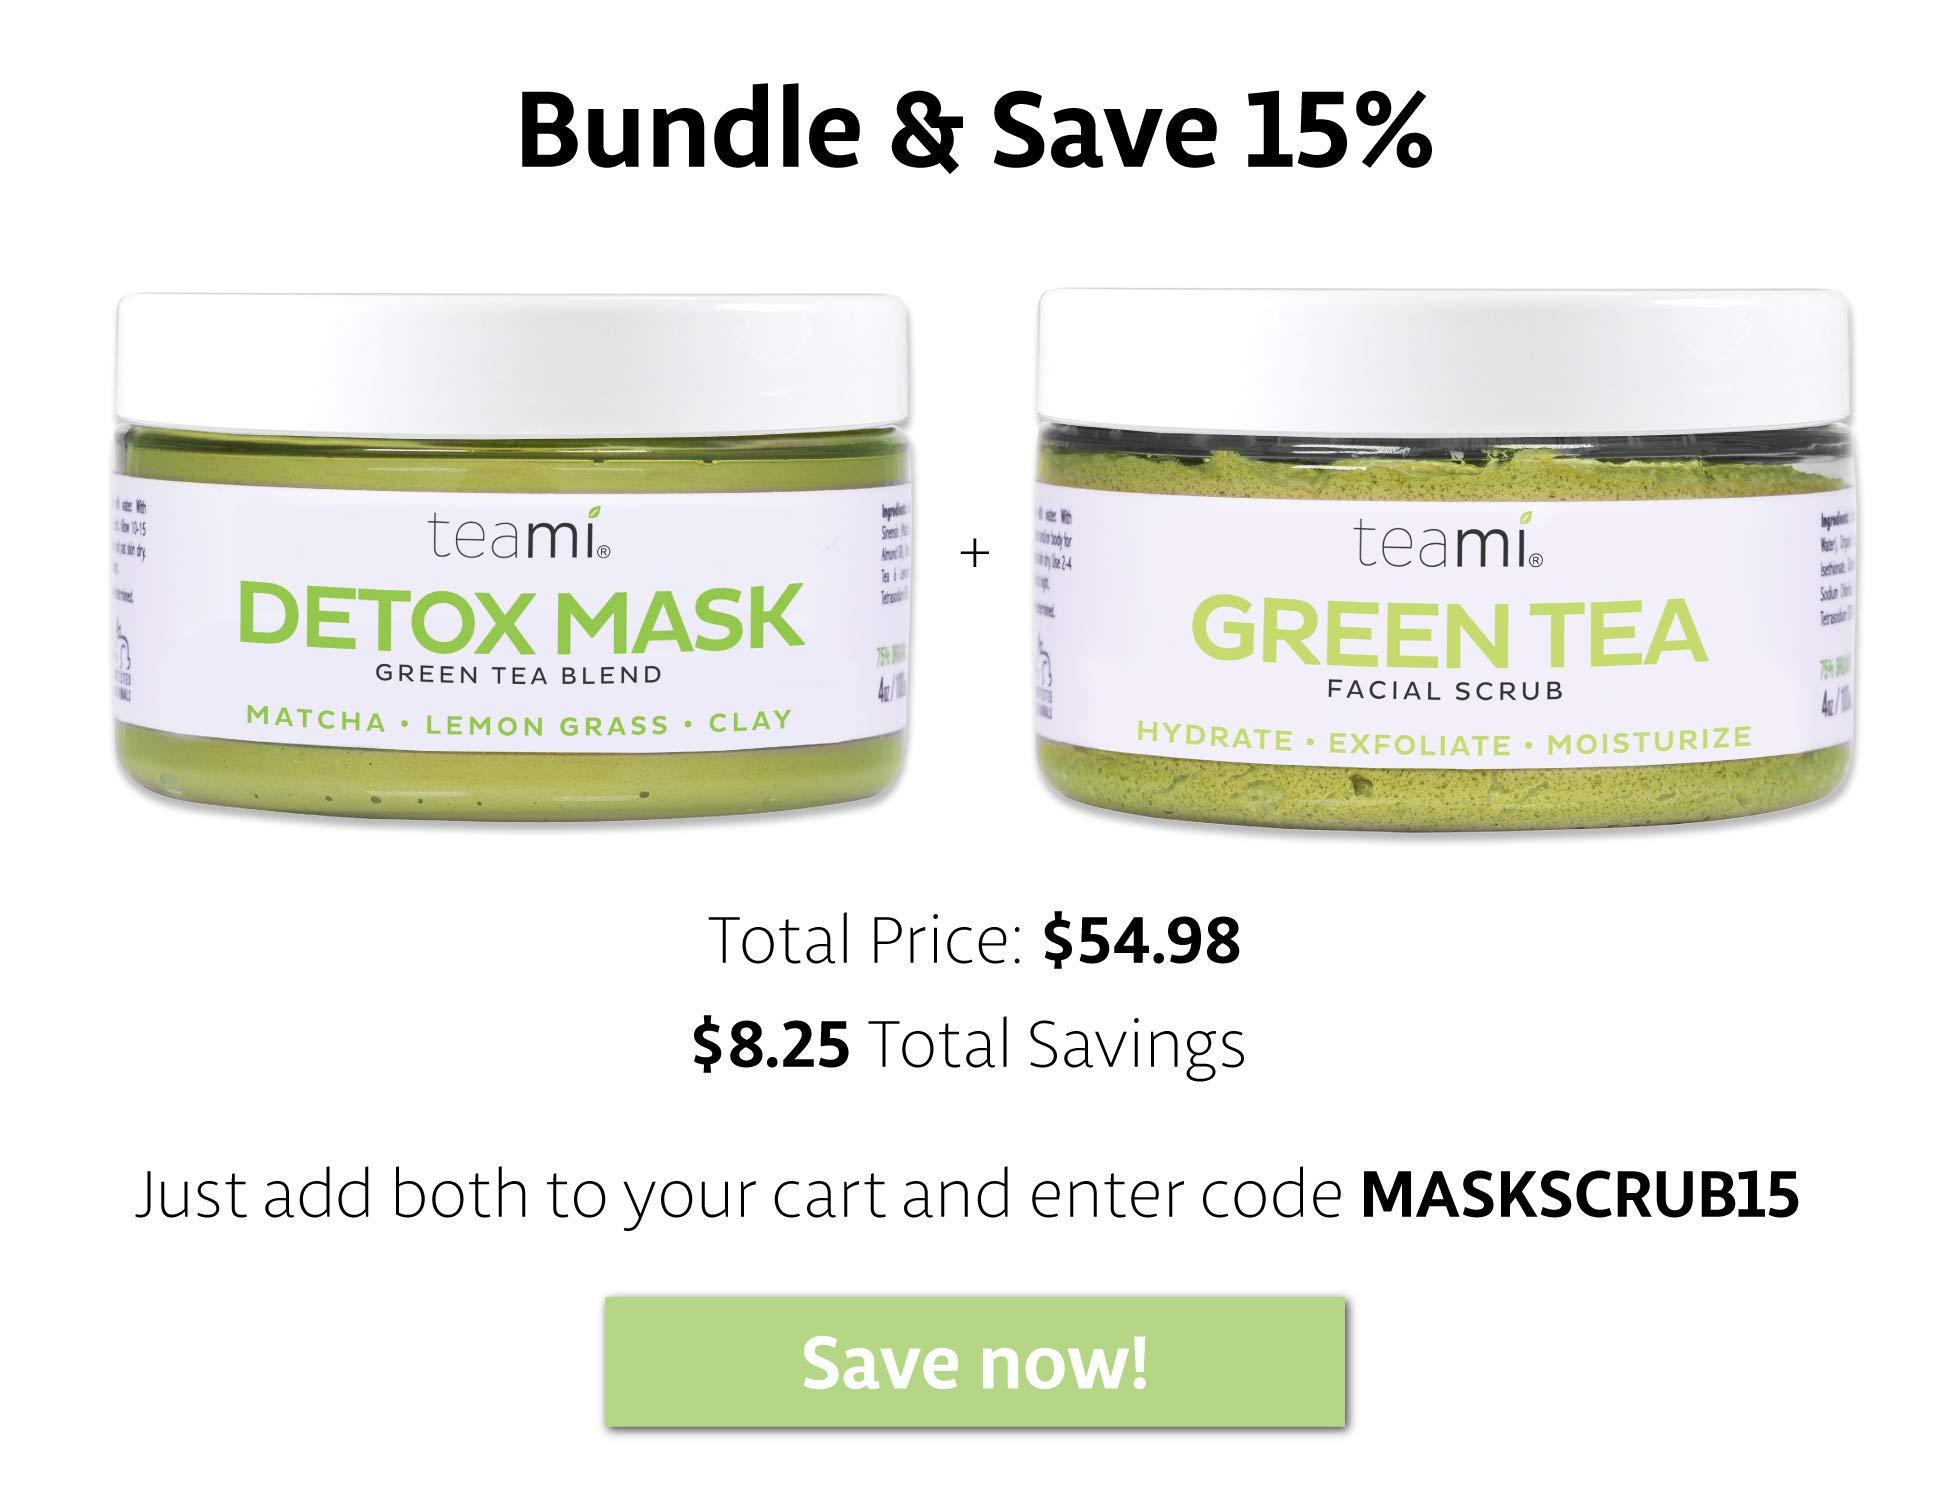 Teami Detox Face Mask - Green Tea Facial Care Mud Mask with Bentonite Clay by Teami